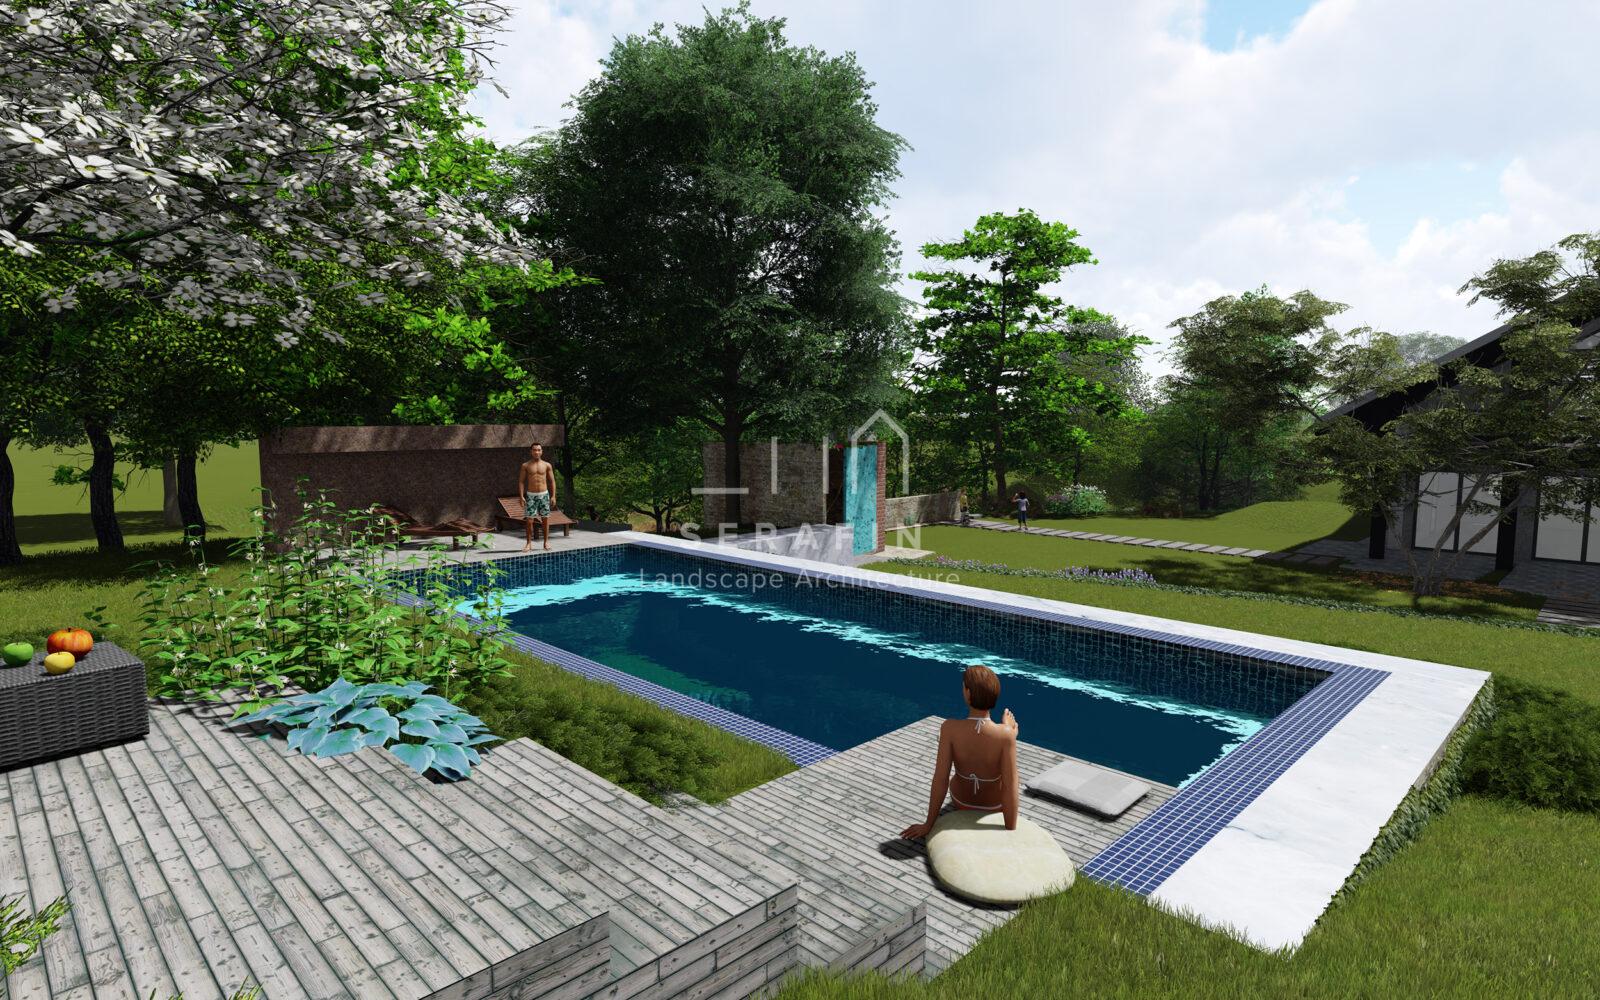 giardino alpino con piscina